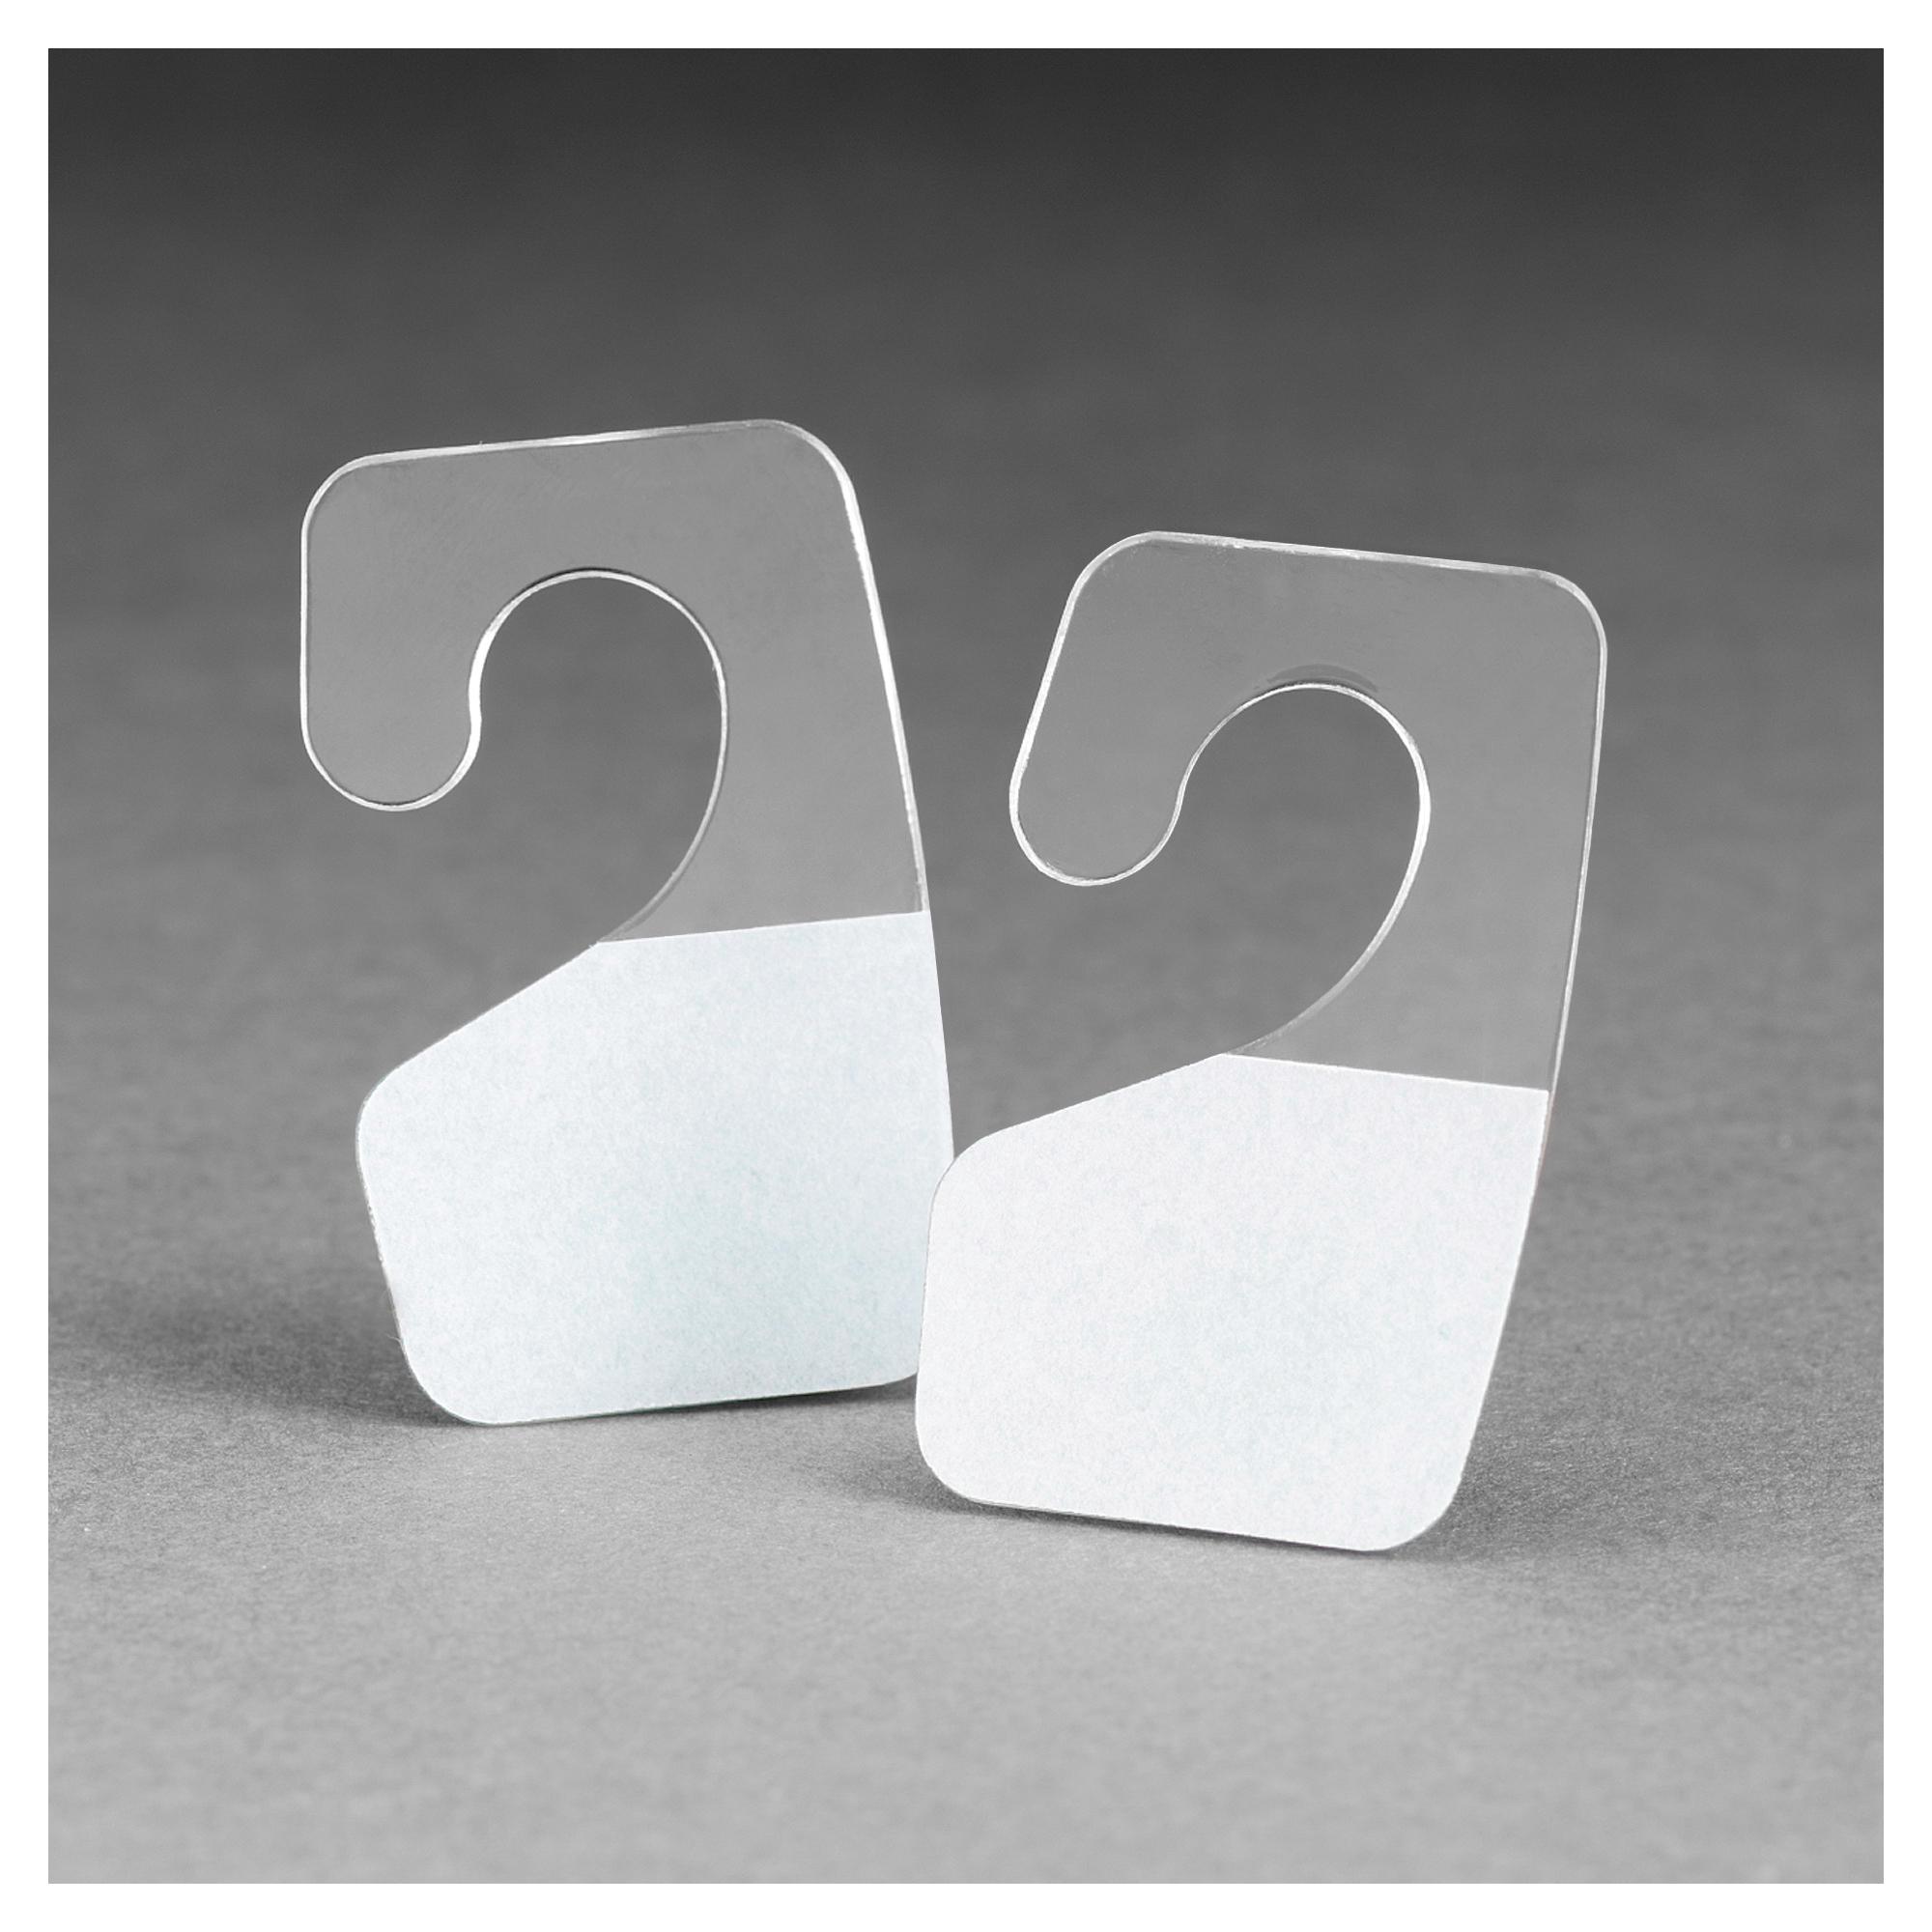 3M™ 021200-73692 J-Hook Hang Tab, 1-3/8 in L x 7/8 in W, Polyester